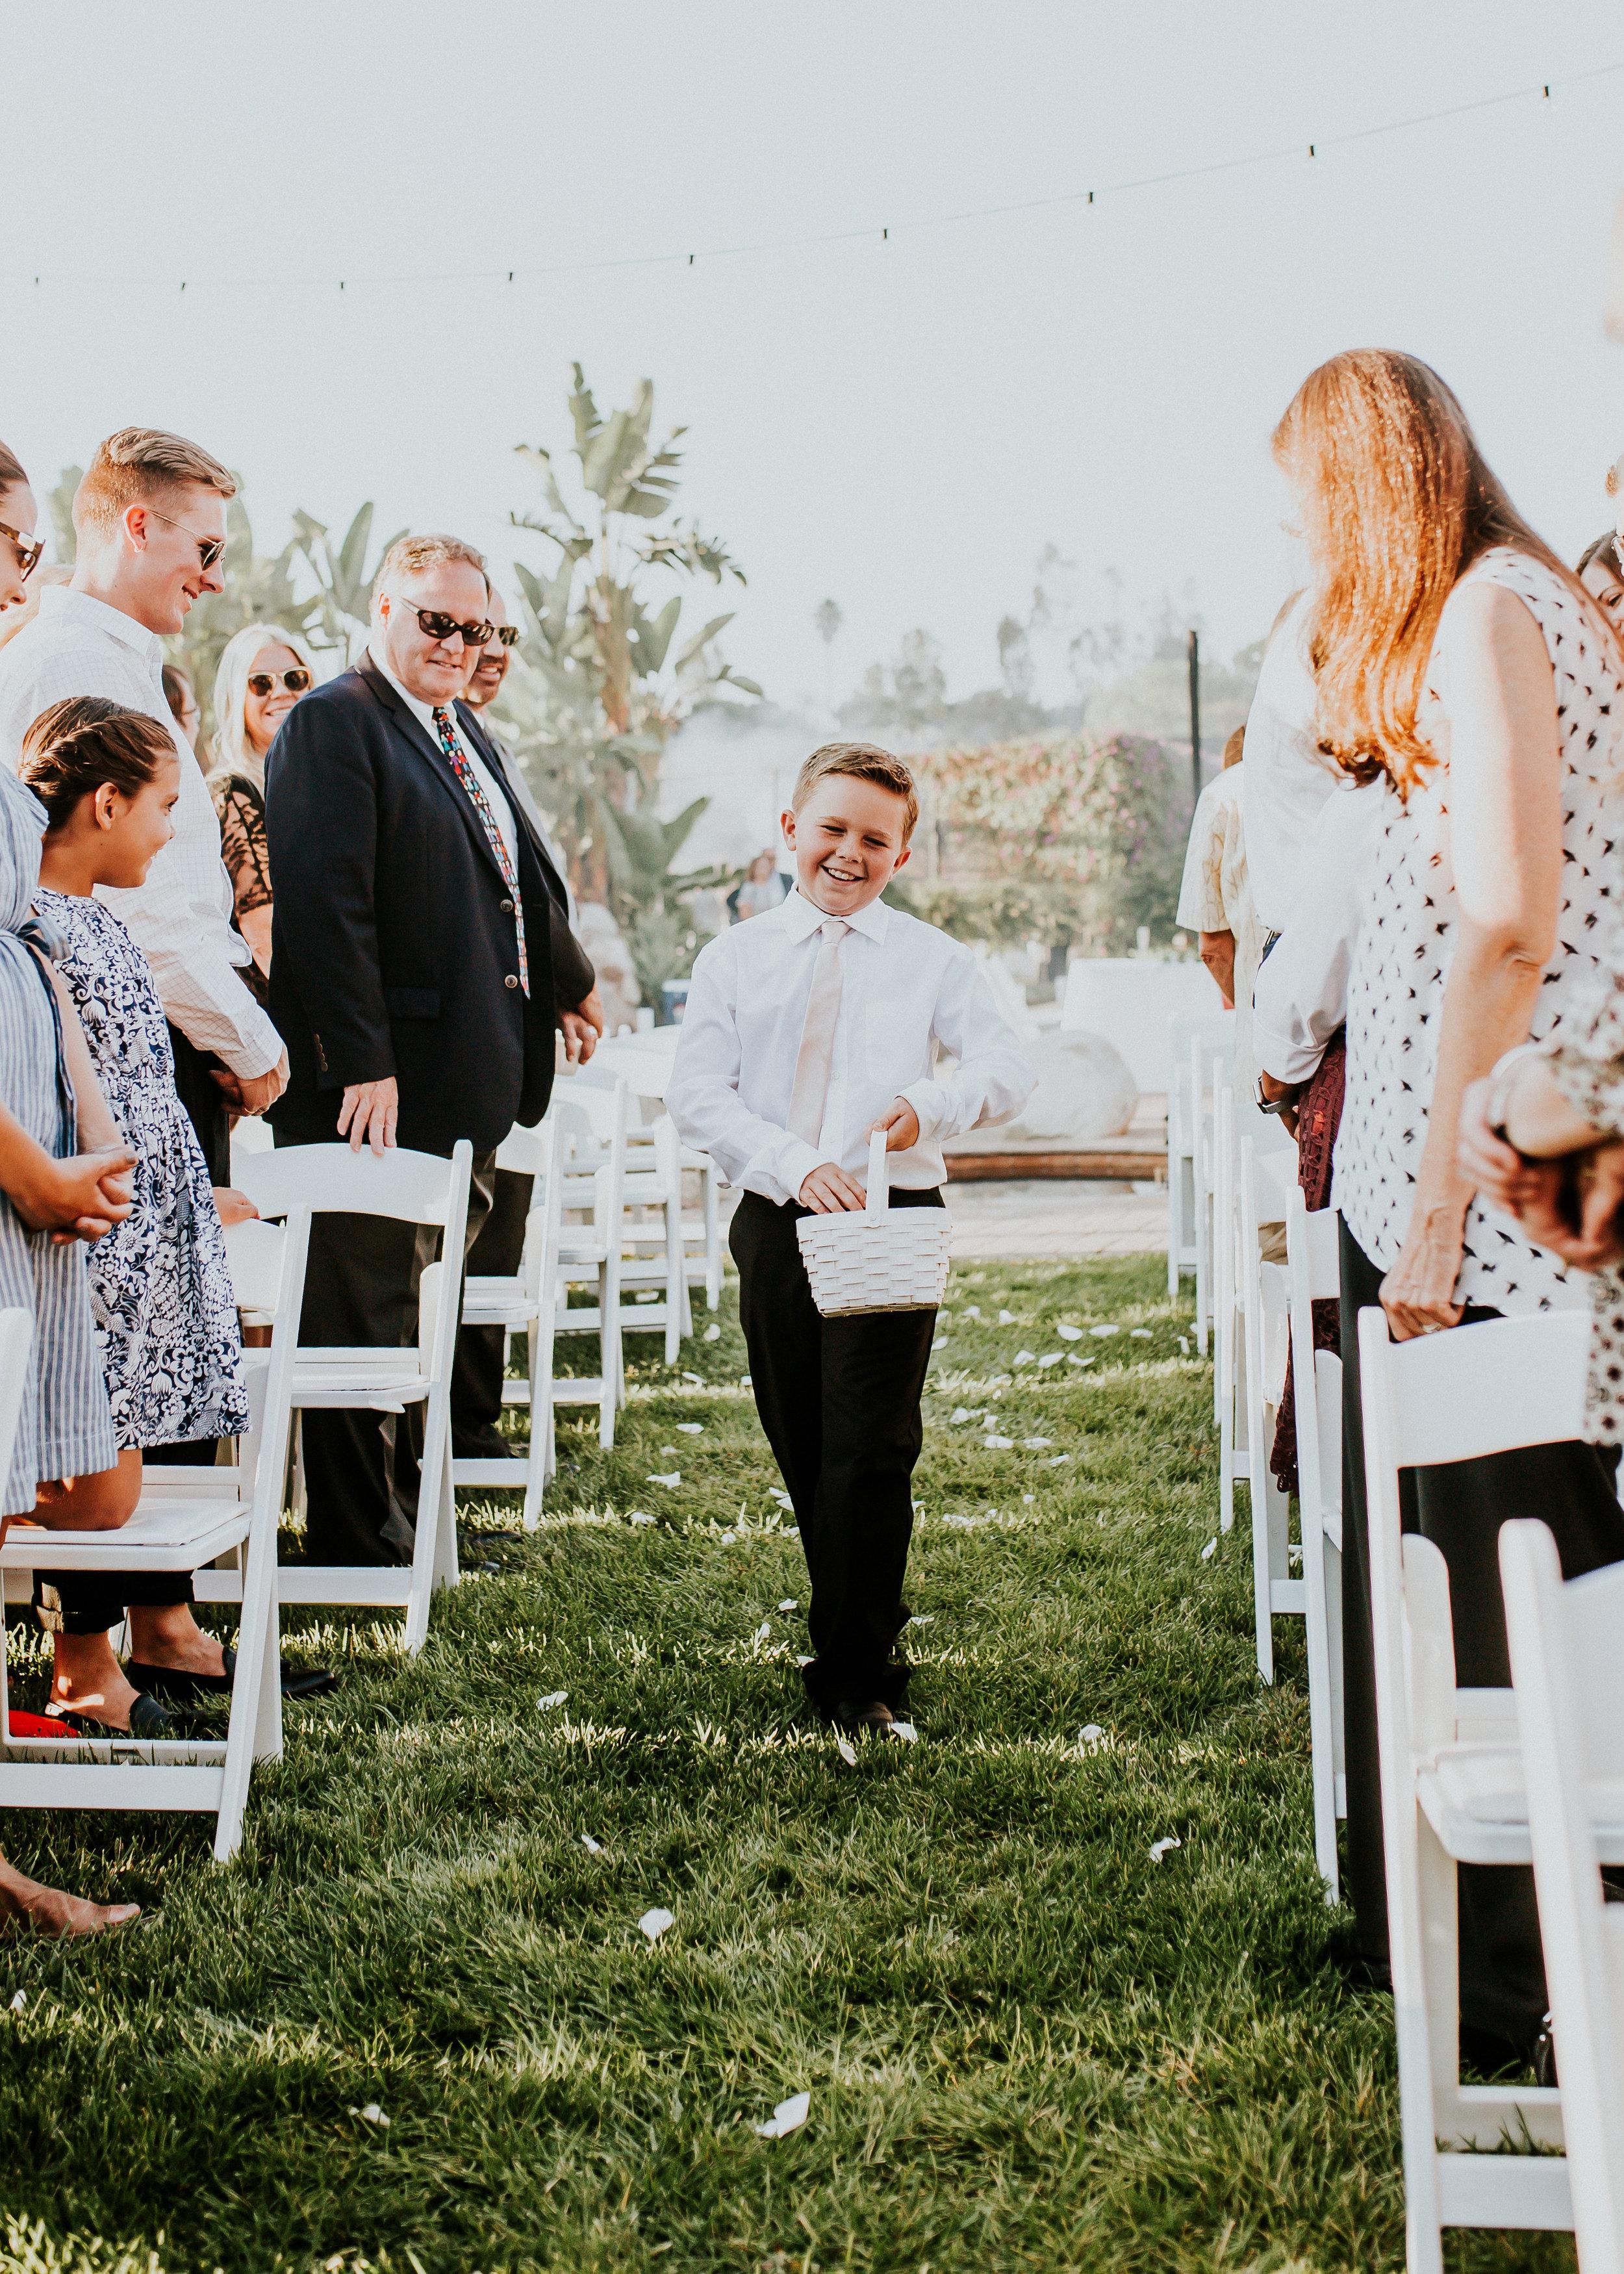 WeddingDay-329.jpg